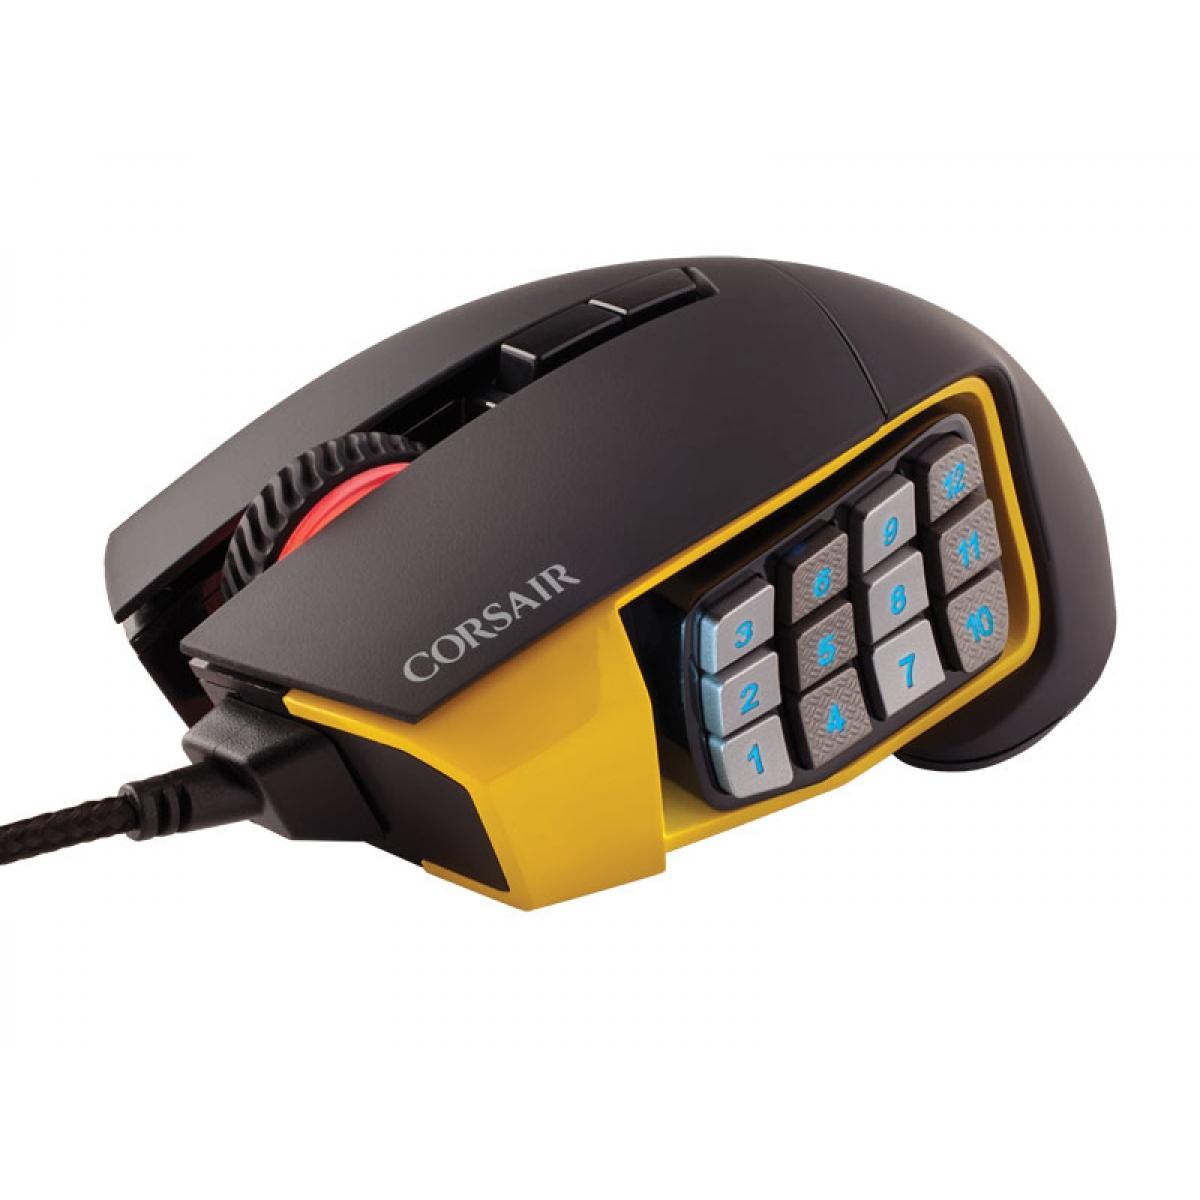 Mouse Corsair Scimitar Rgb 12000 Dpi Black/Yellow Ch-9000091-Na